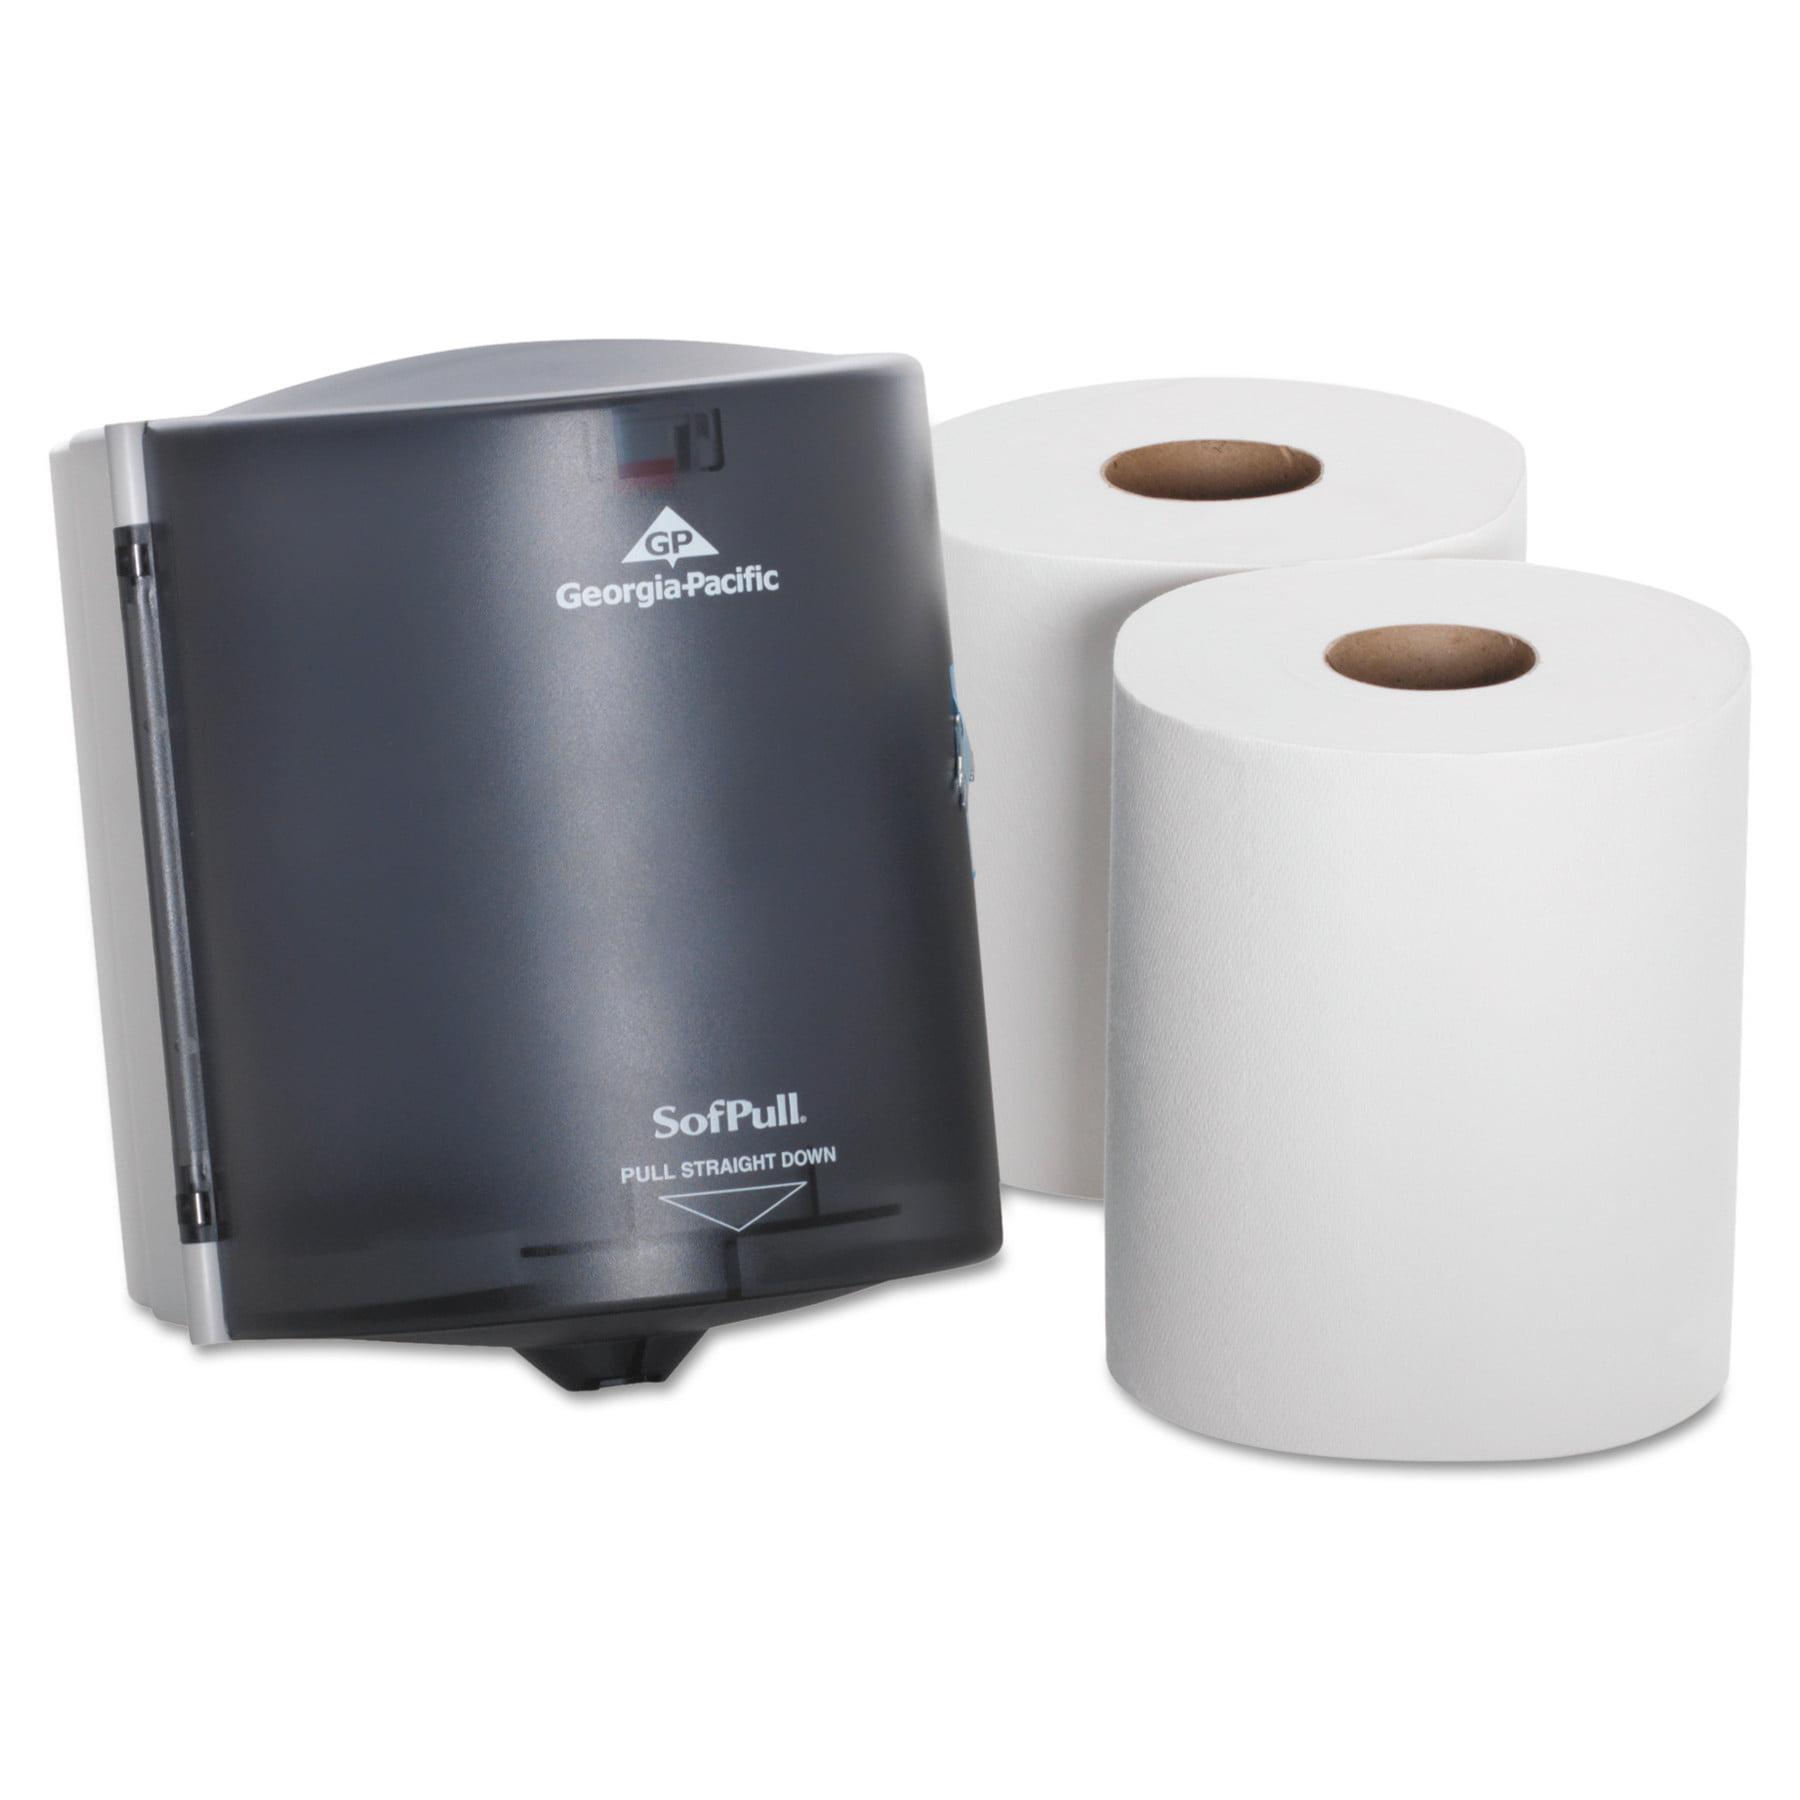 Georgia-Pacific Sofpull Trial Kit, 58205, Centerpull Paper Towel Dispenser Combo, Includes Dispenser and 2 Rolls, Translucent Smoke